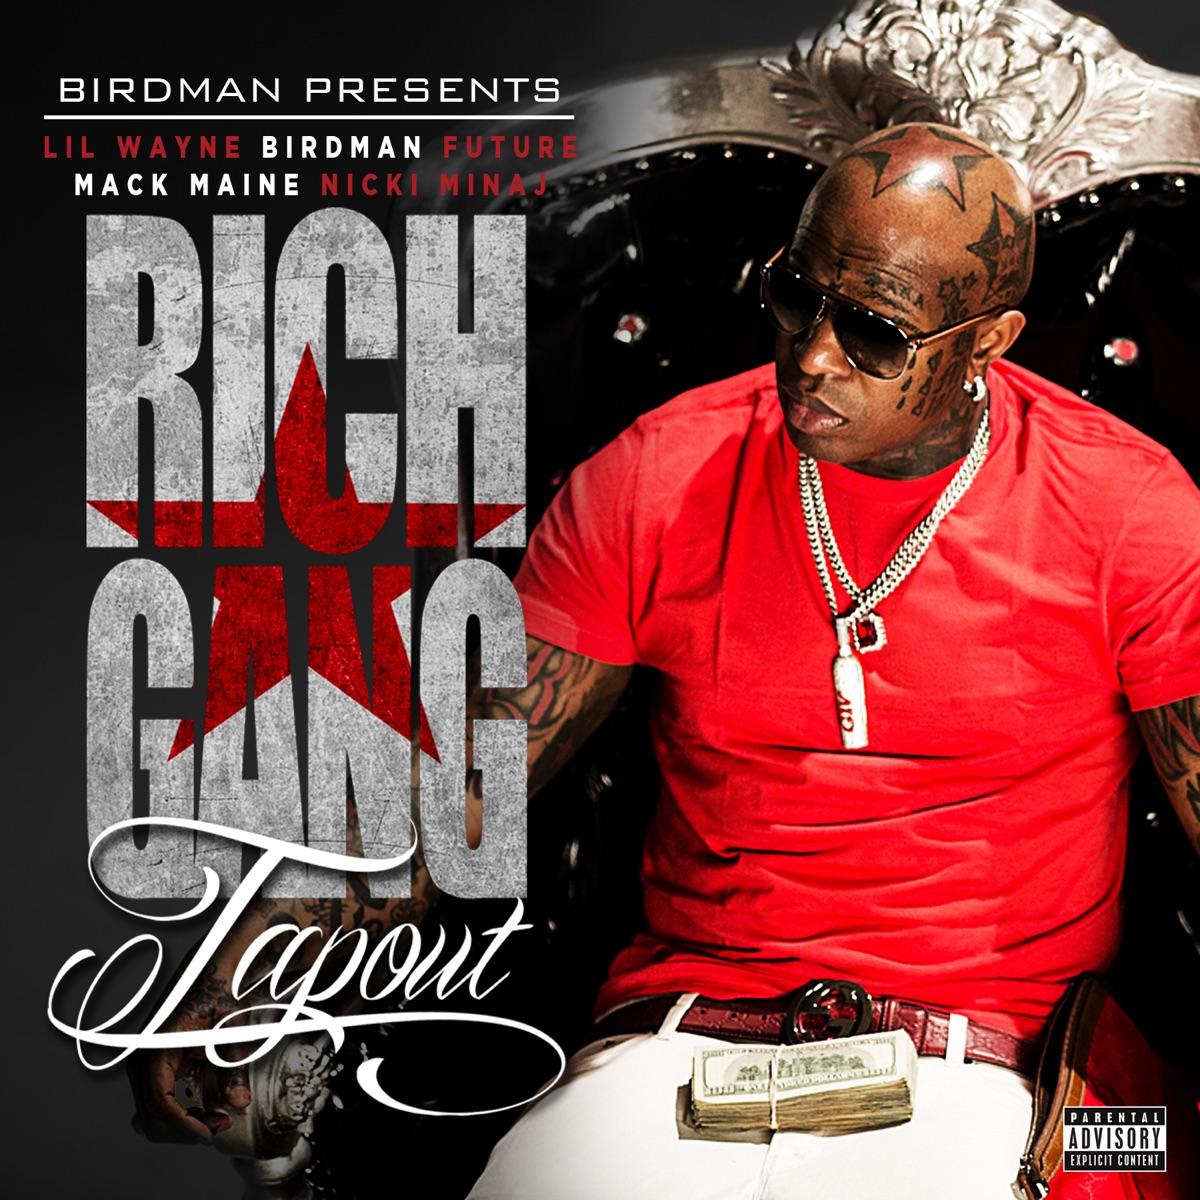 Tapout feat Lil Wayne Birdman Mack Maine Nicki Minaj  Future - Single Rich Gang CD cover